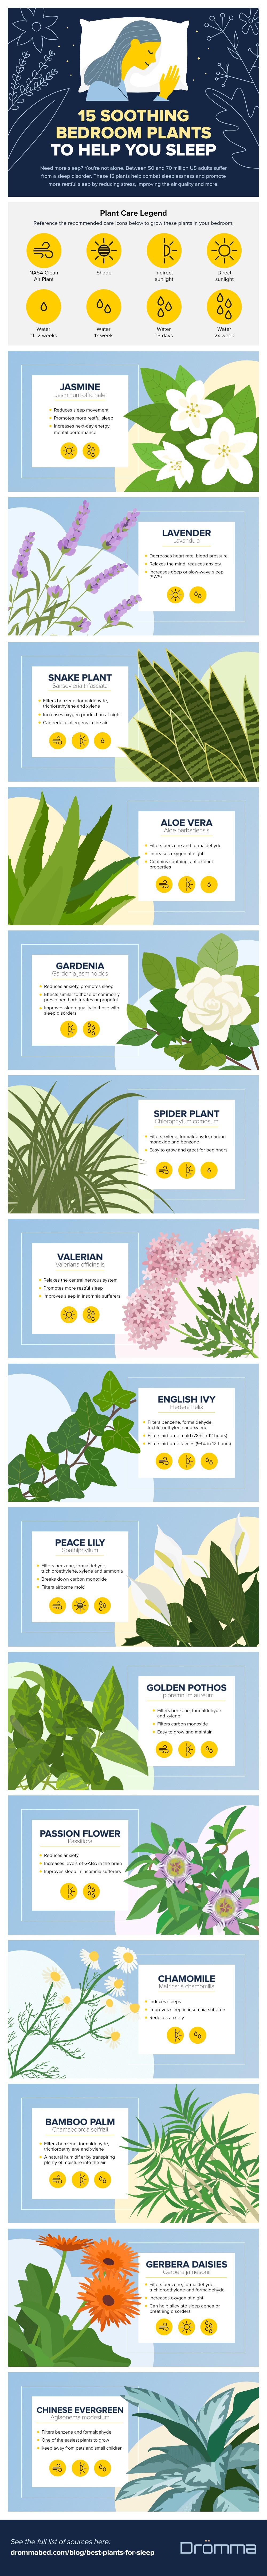 Infographic on plants that help sleep